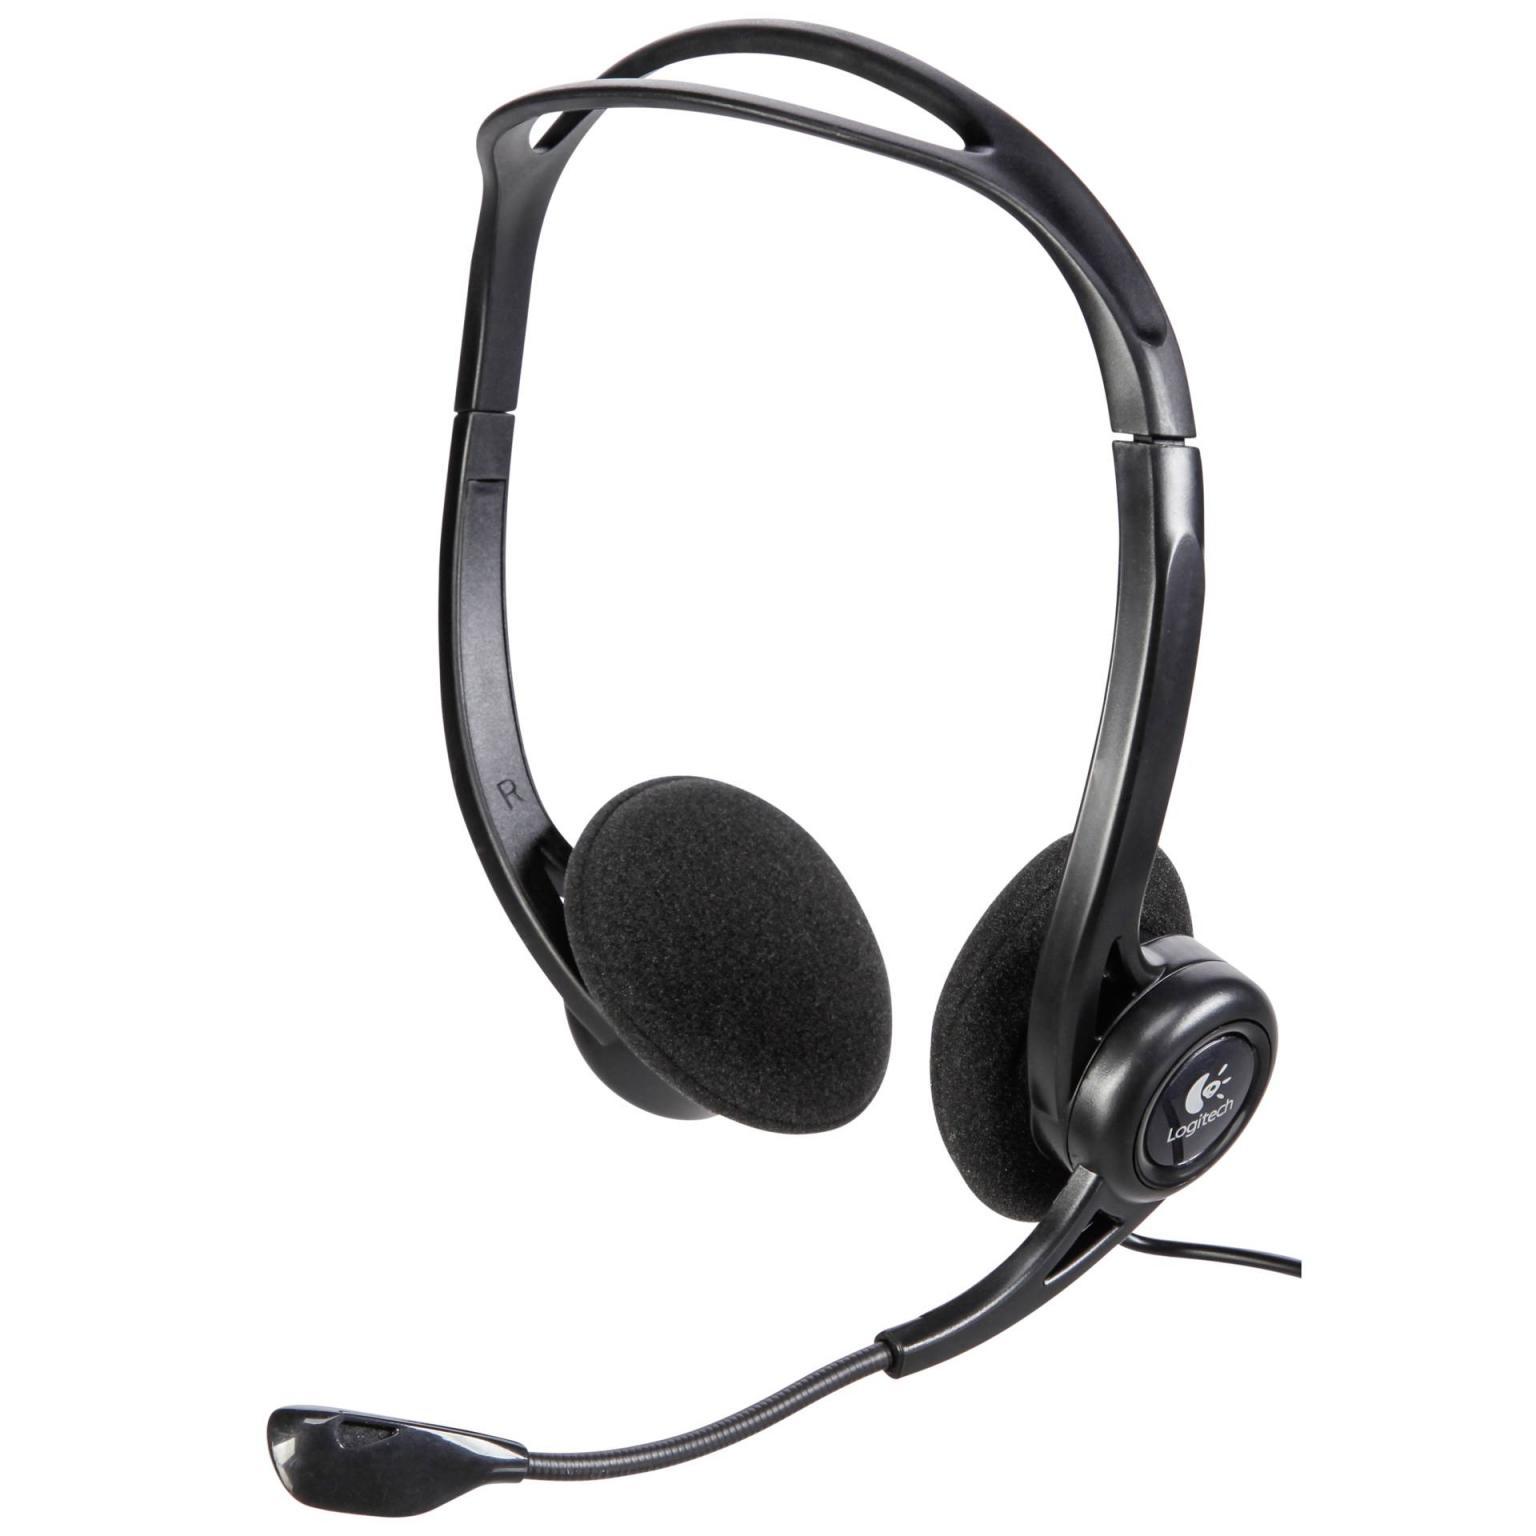 Logitech Headset PC 960 Kopfbügel USB Stereo schwarz